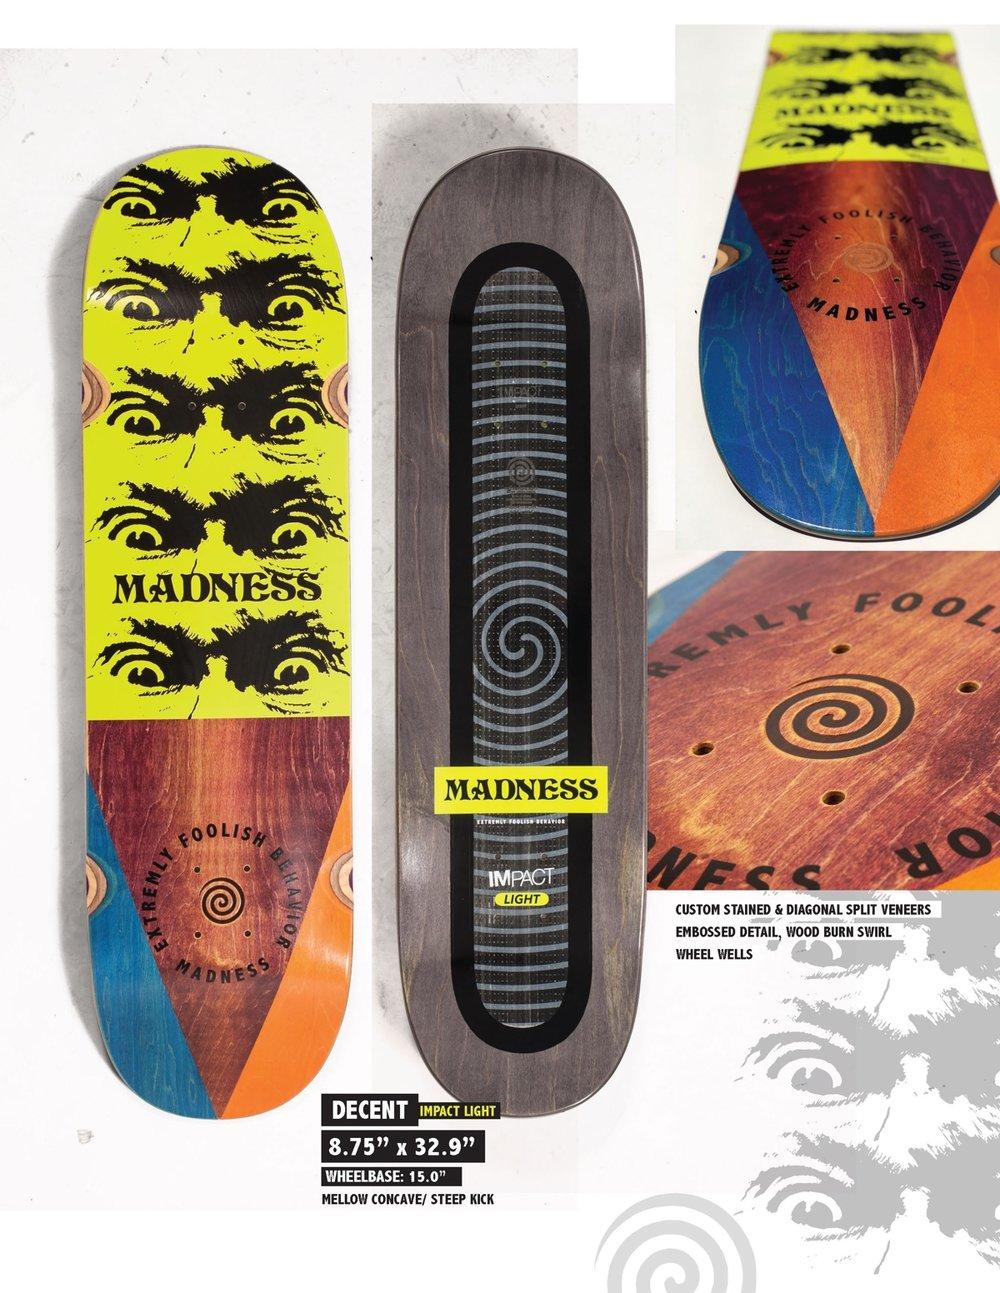 Copy of MADNESS Decent 8.75 Impact Light Skateboard Deck